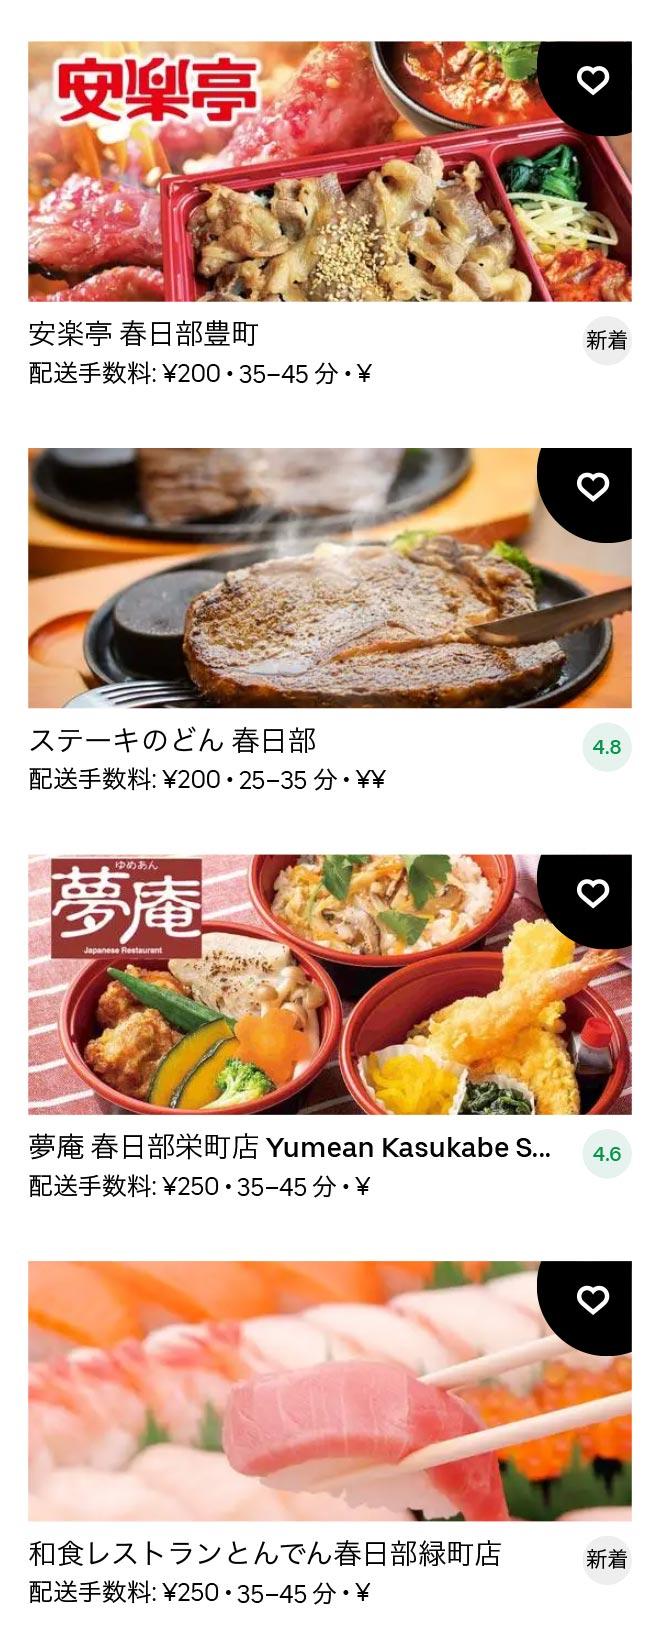 Kasukabe menu 2101 10